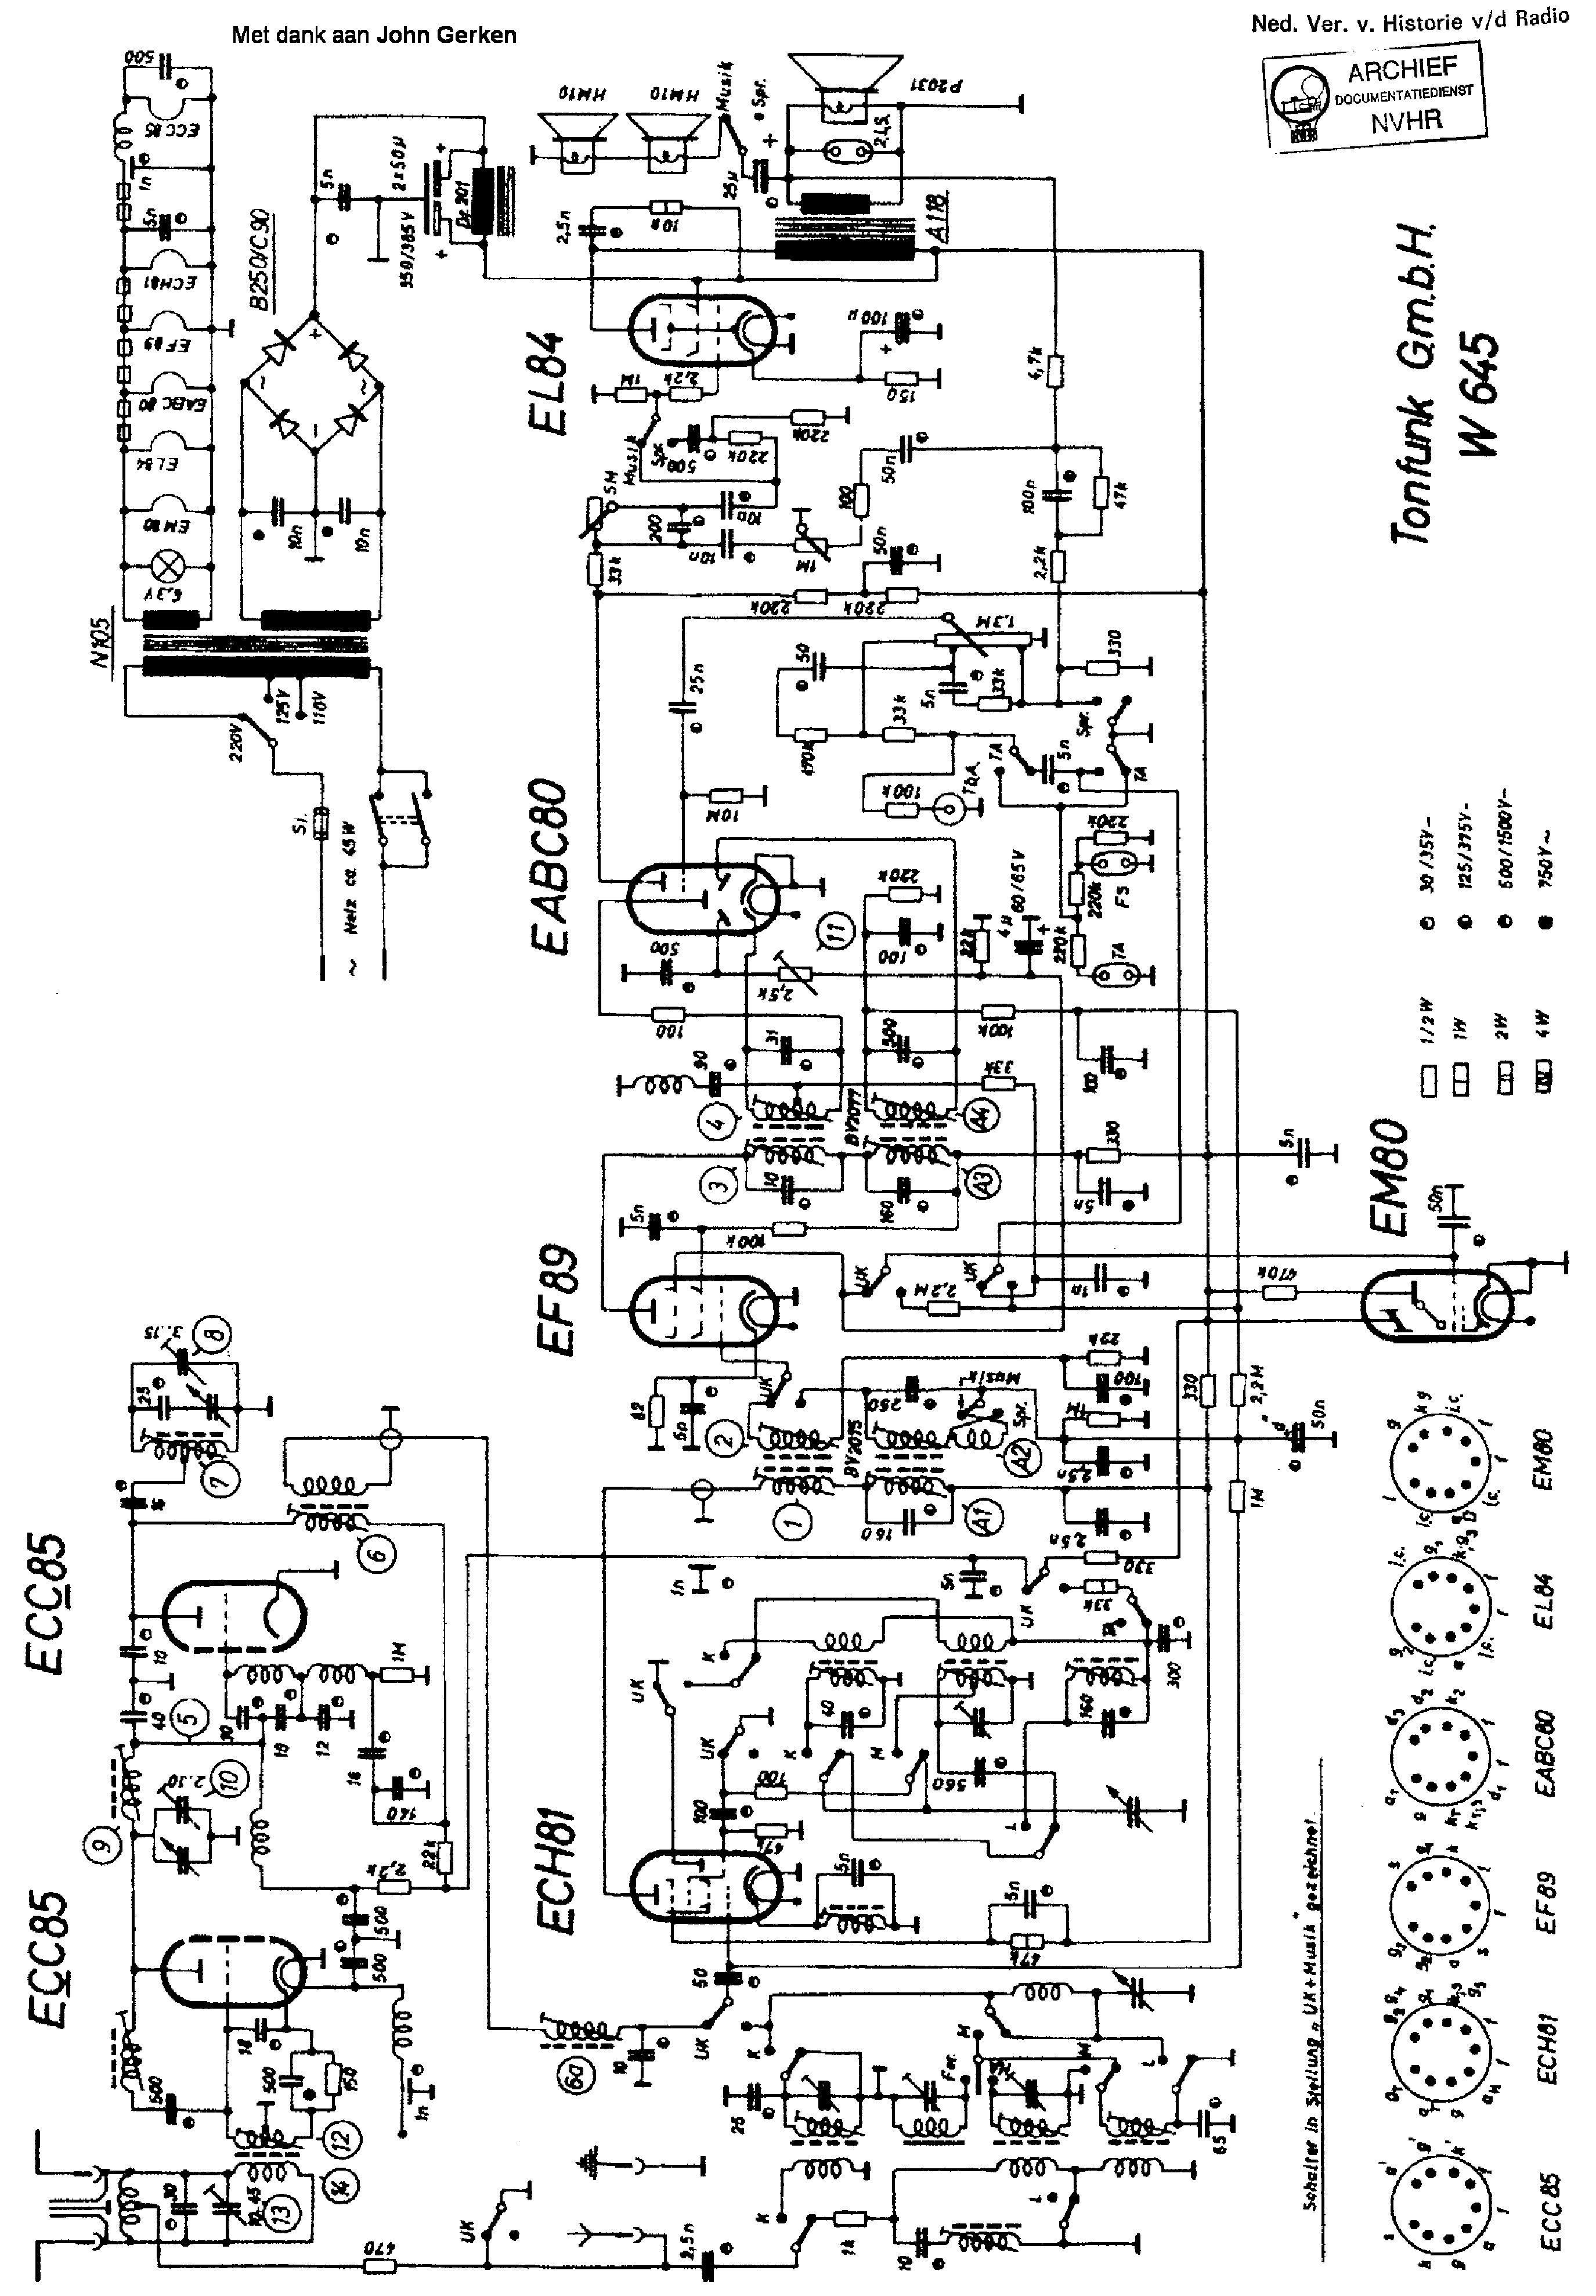 Tonfunk W350 4d Violetta Am Fm Receiver Sch Service Manual Download Schematics Eeprom Repair